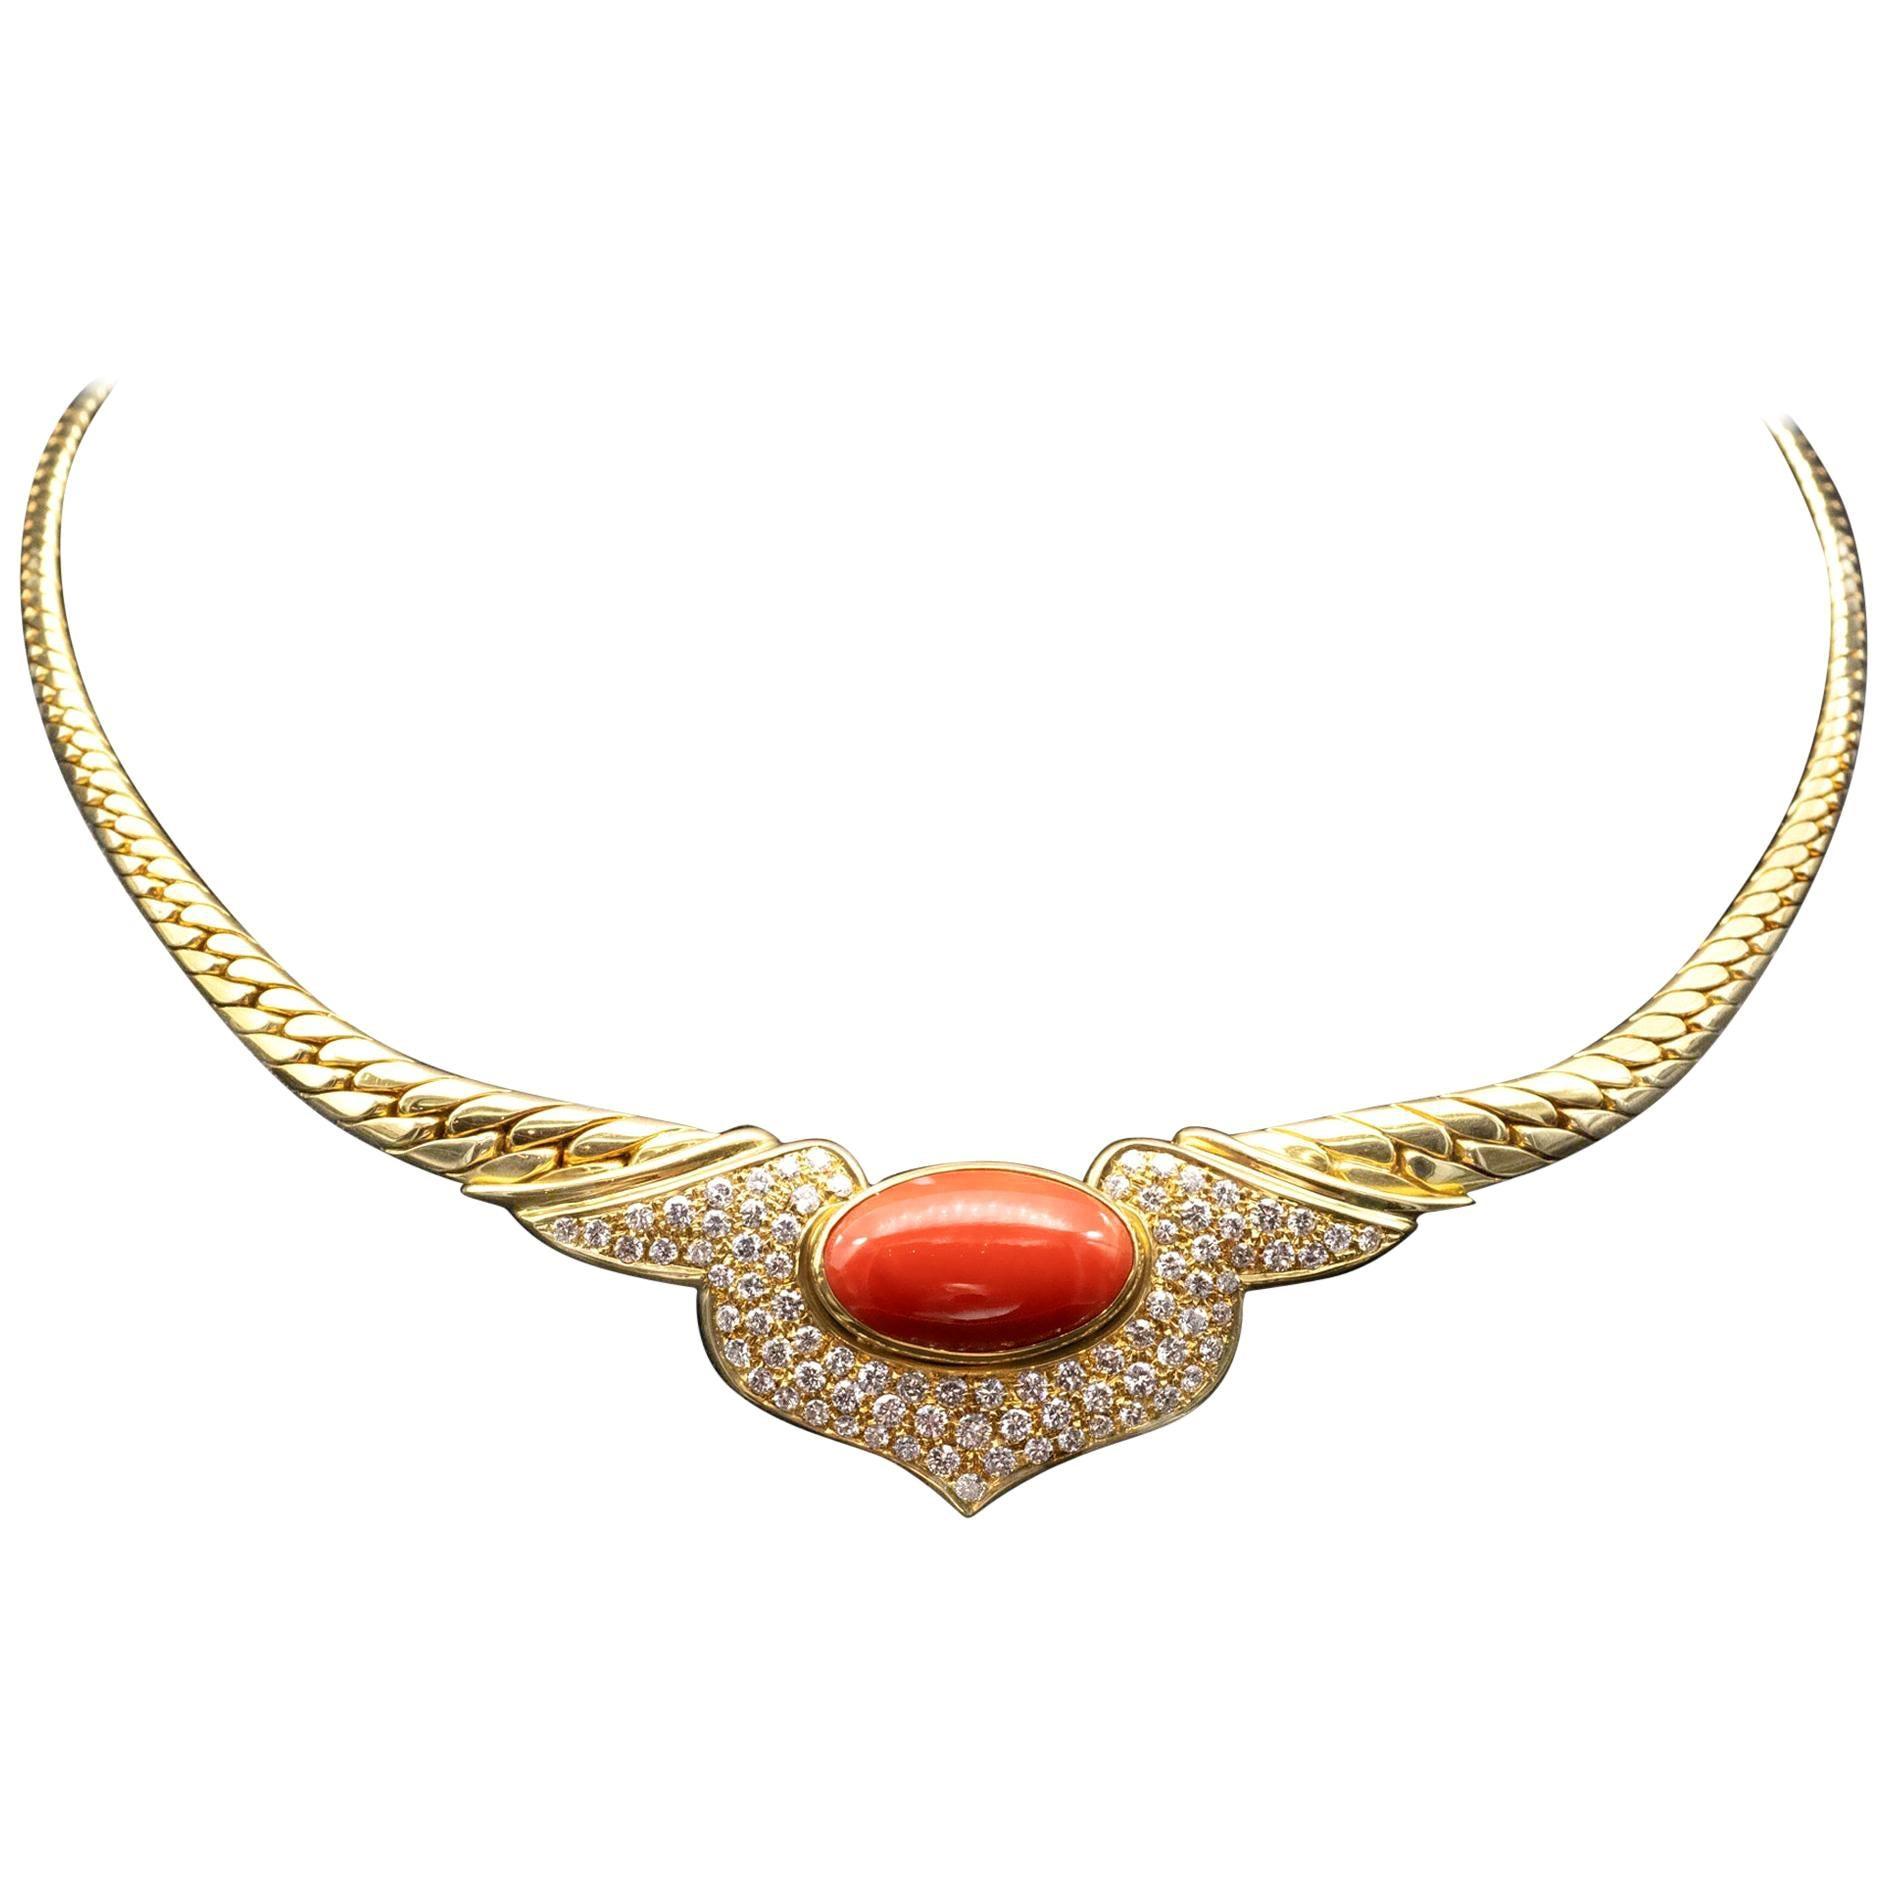 18 Karat Coral and Diamond Necklace